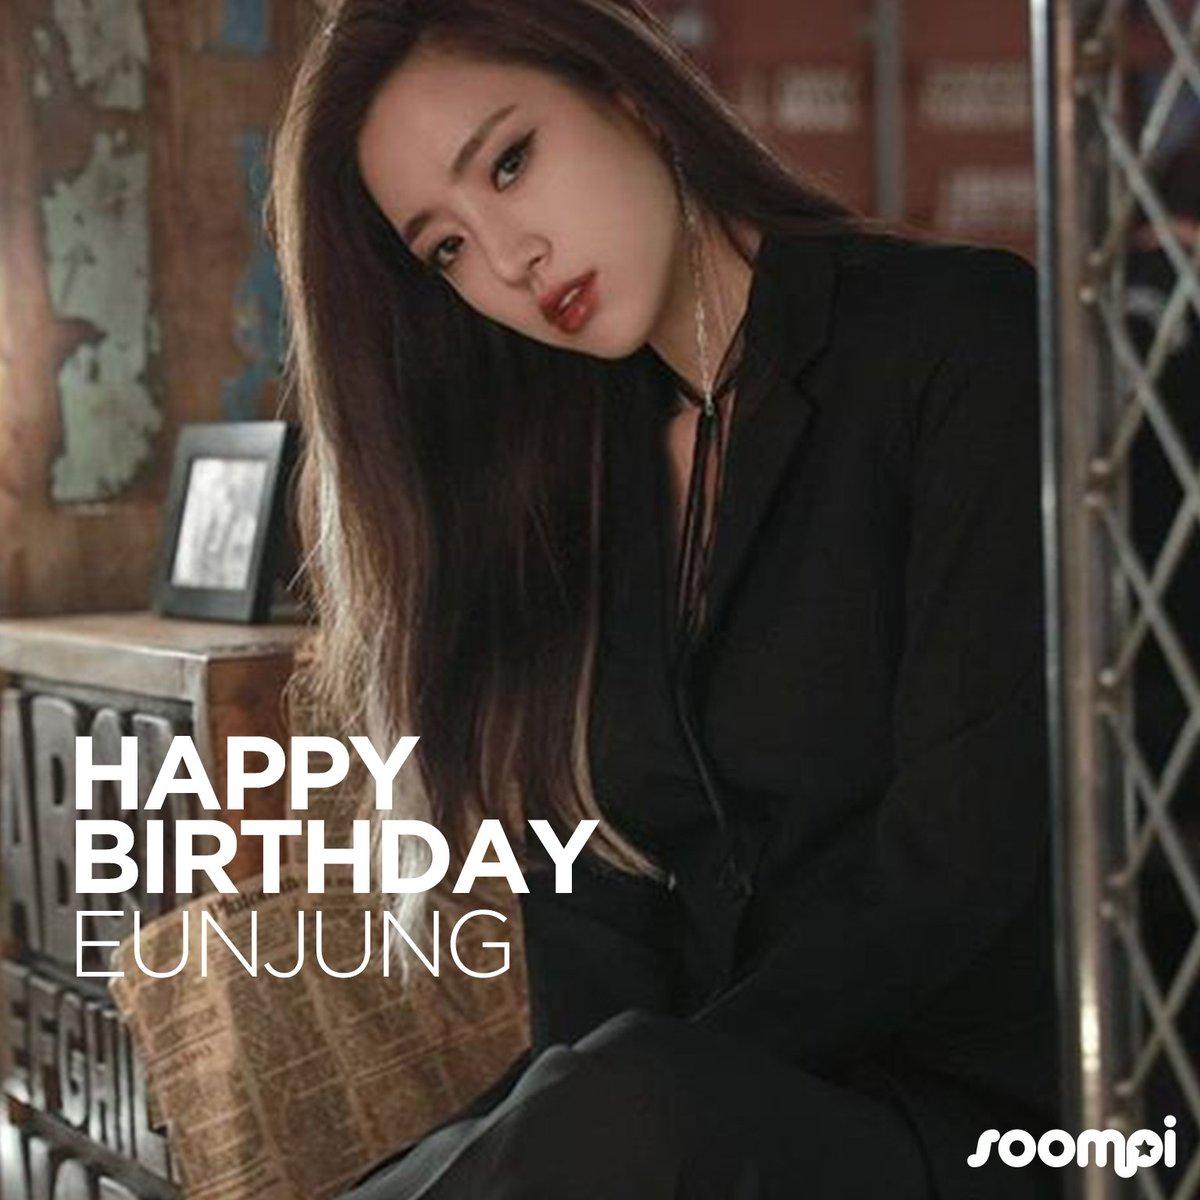 Happy Birthday to #T_ARA's Eunjung! #Hap...